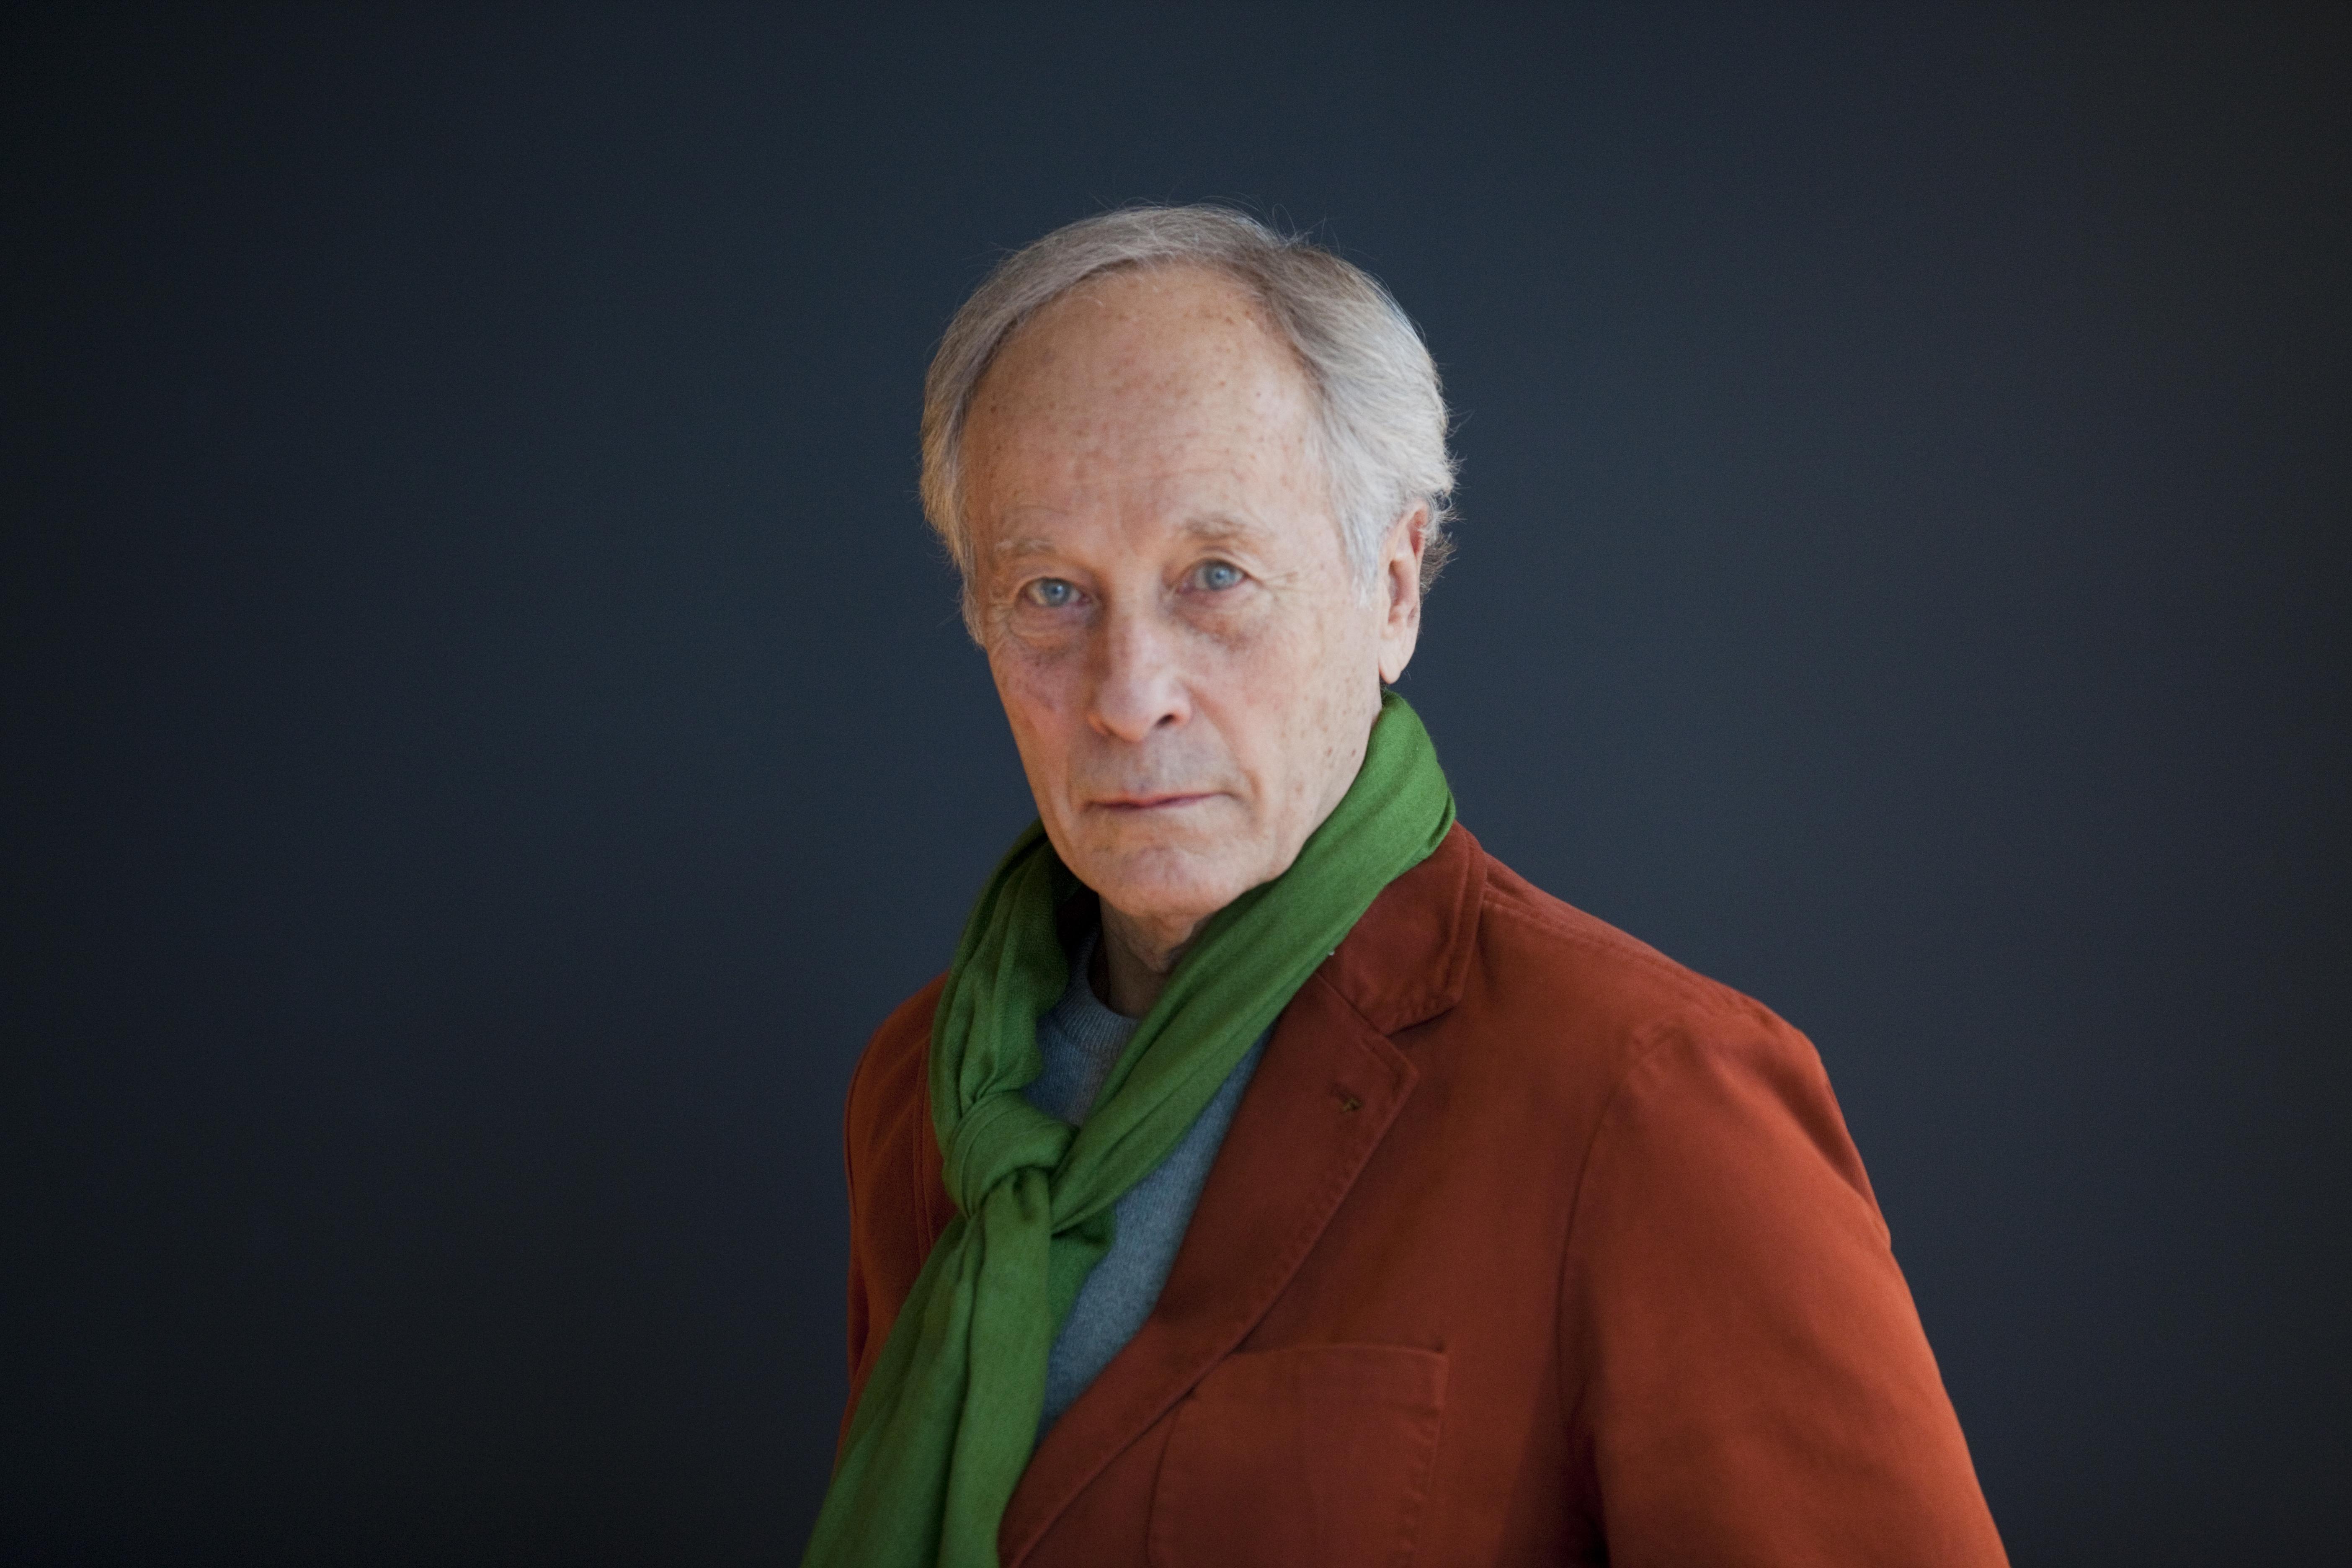 Lifetime Achievement Award for Richard Ford?